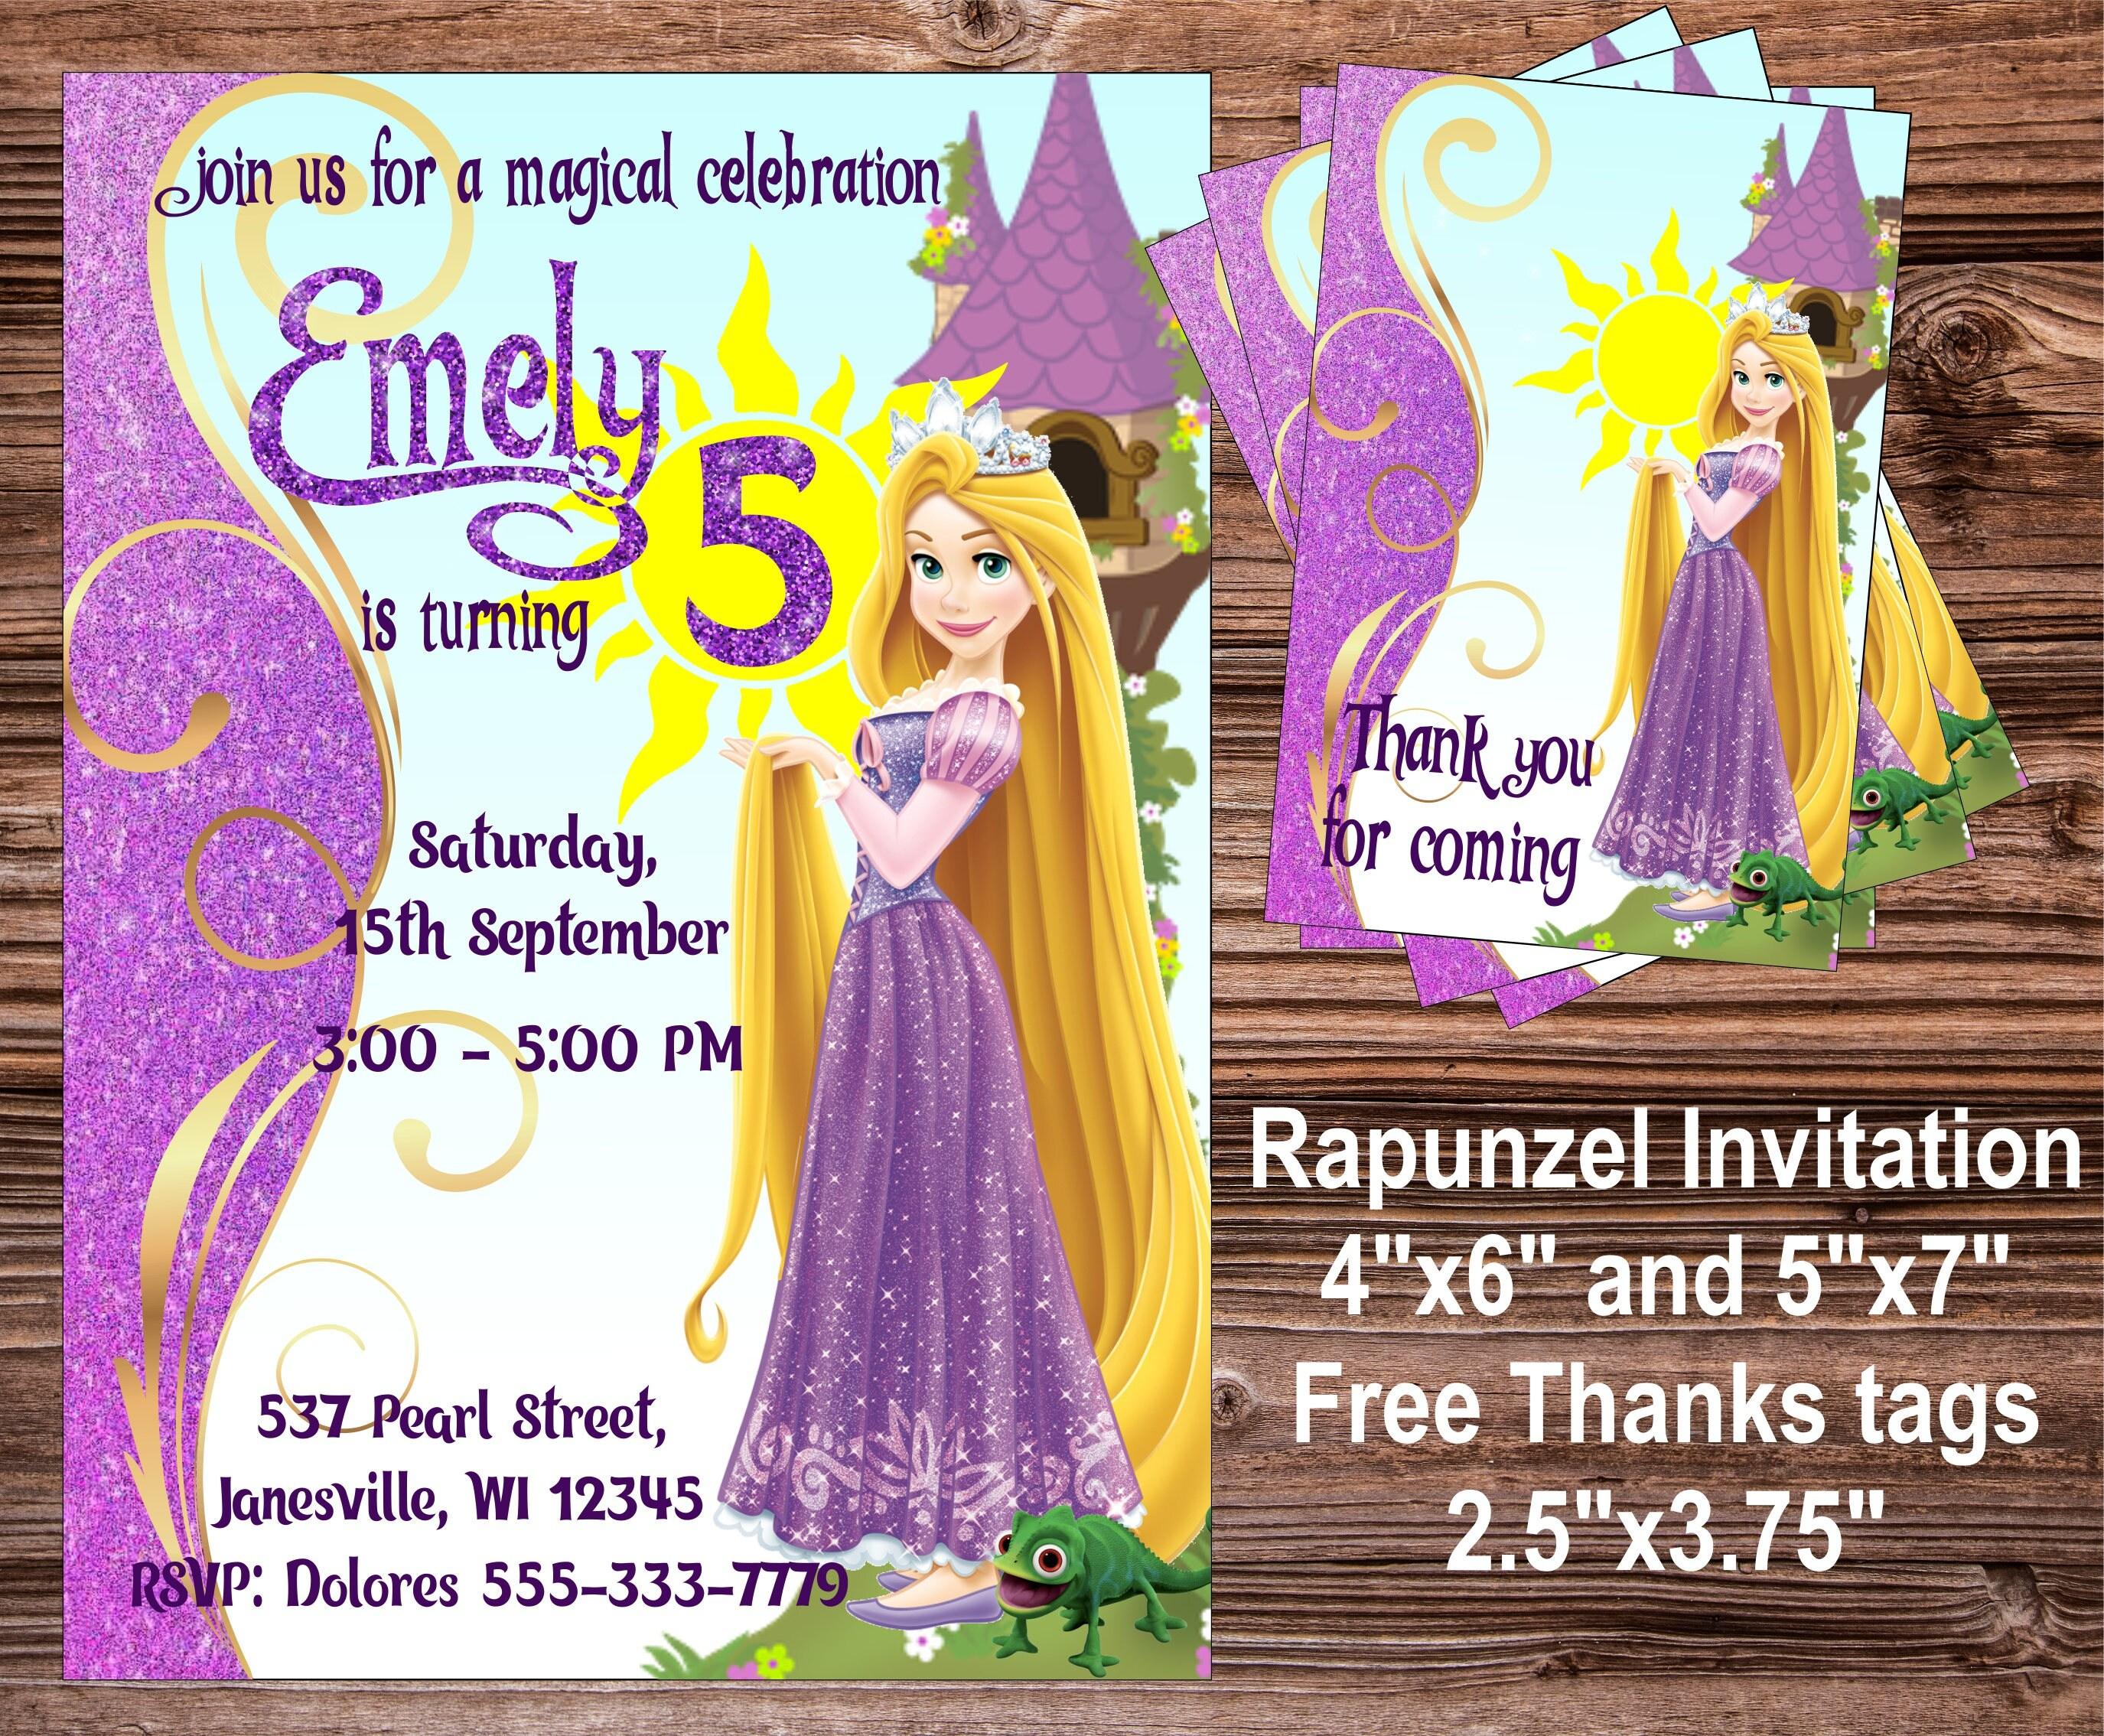 Unique Rapunzel Birthday Party Invitations Mold Invitation Card